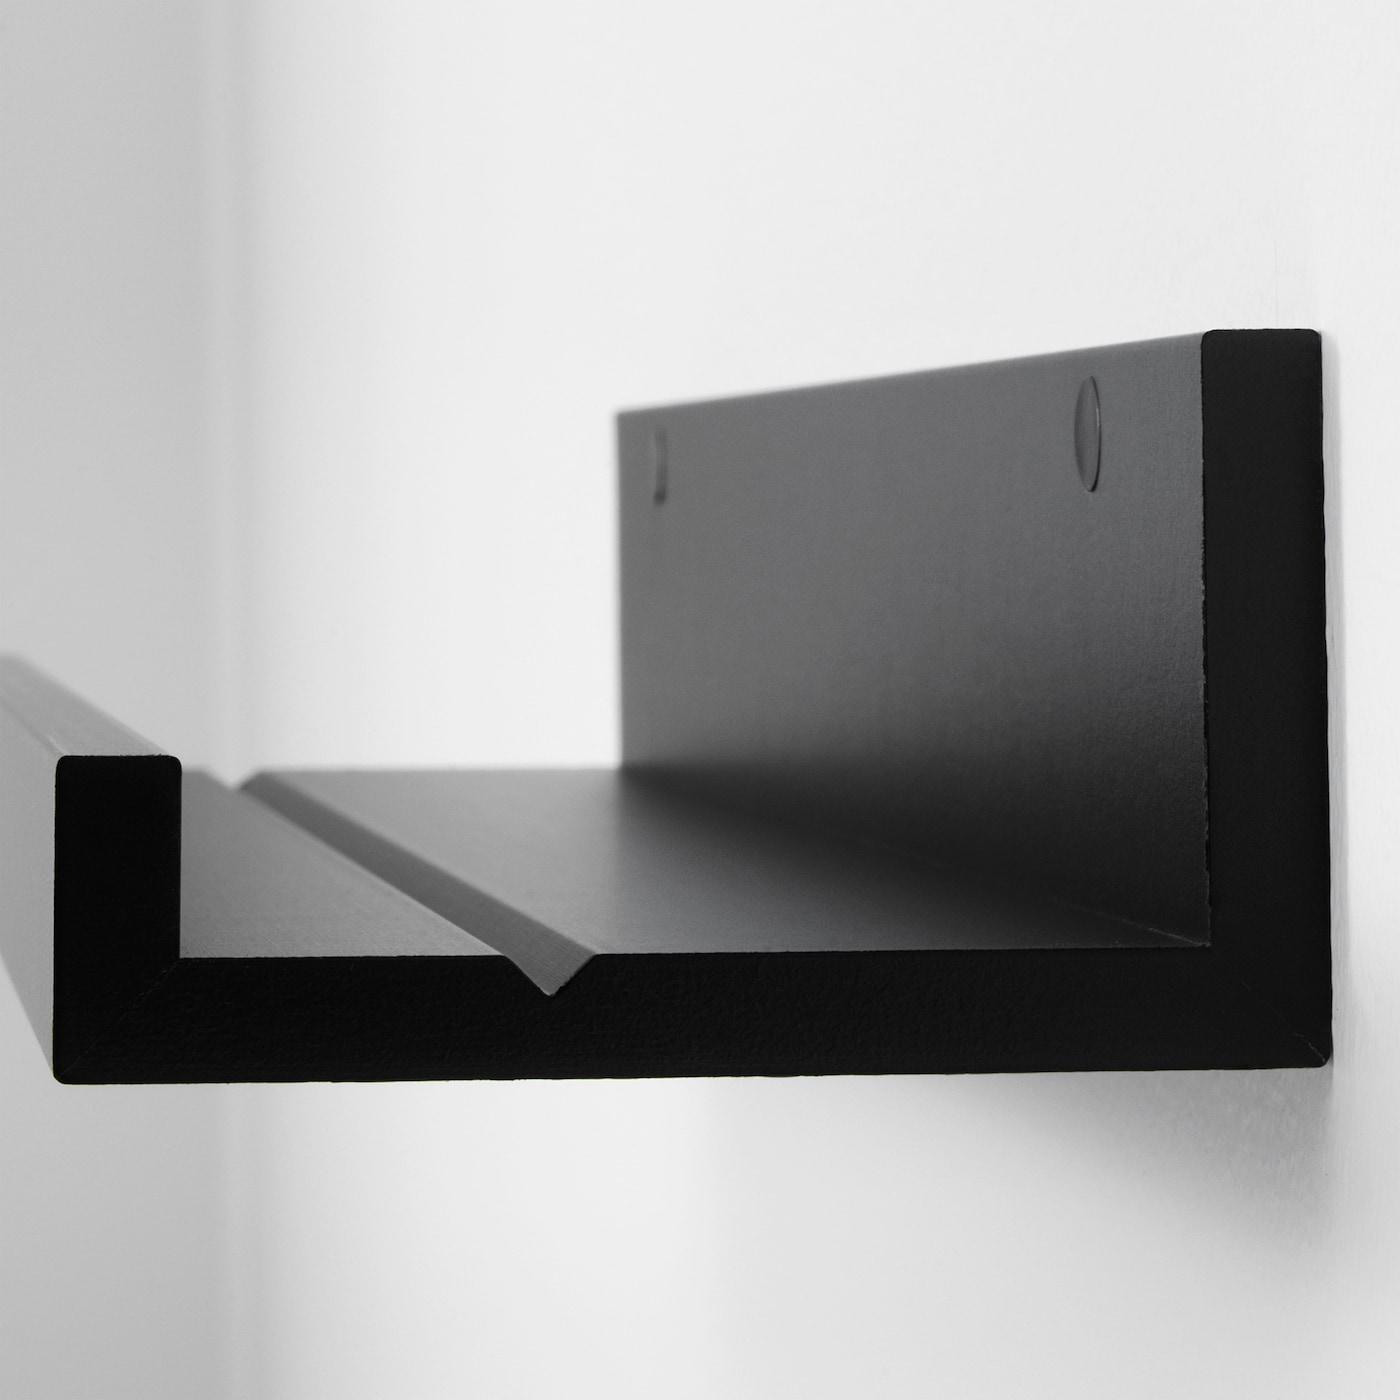 WHITE 55cm /& 115cm IKEA MOSSLANDA PICTURE LEDGE SHELF BLACK